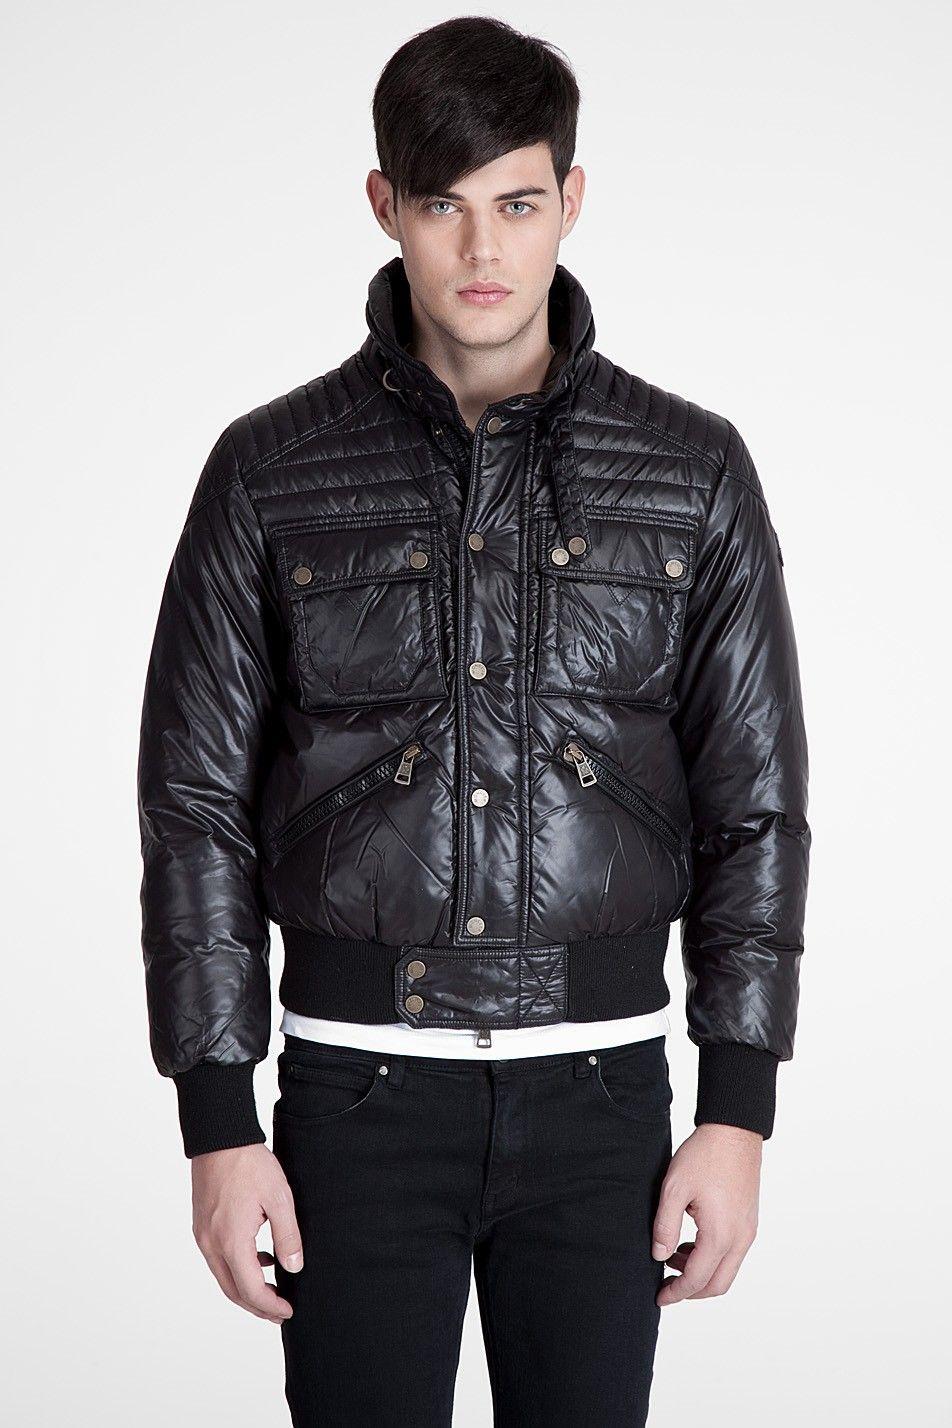 http://www.warmjackets4u.com/moncler-men-s-jackets-columbus-down-in-black.html